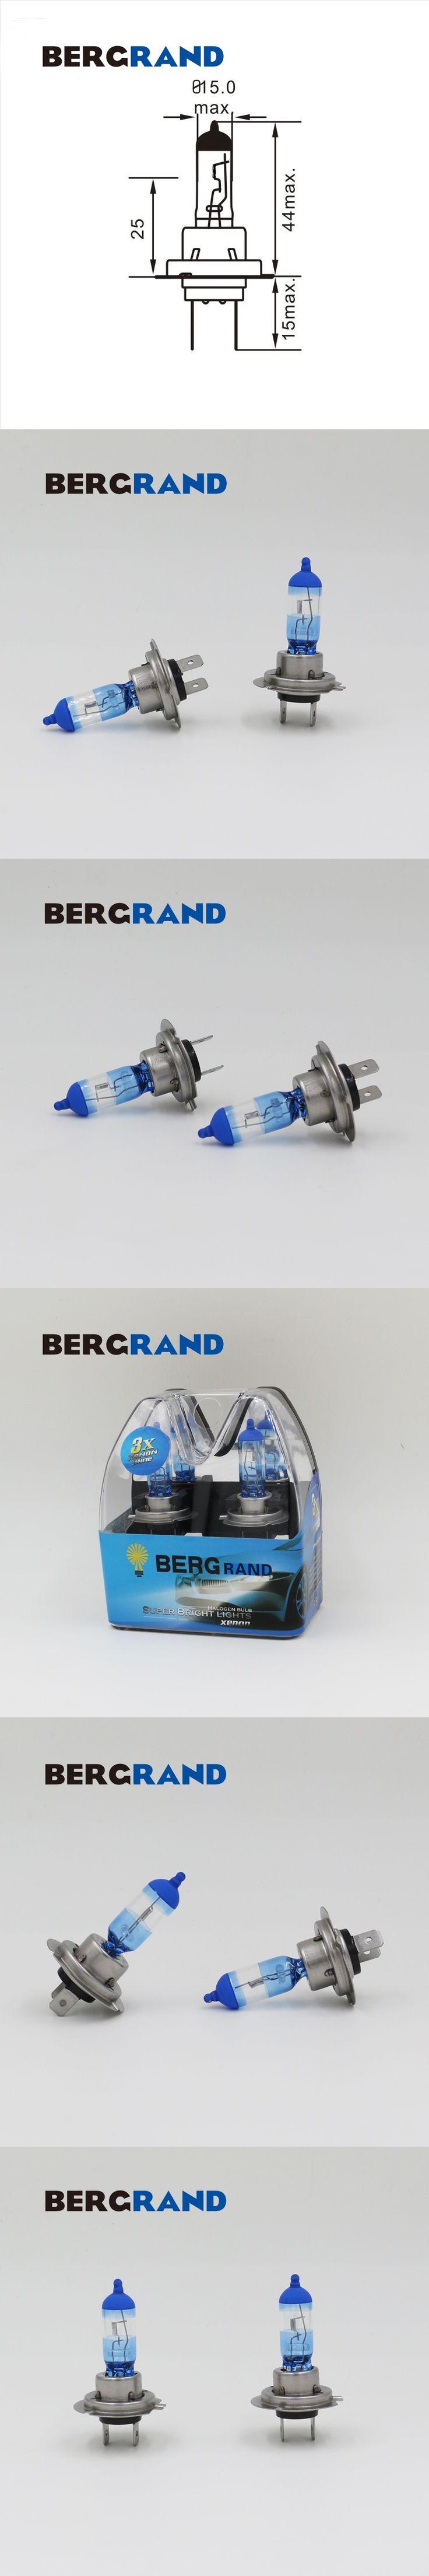 Car Light H7 Headlight Bulb 55W External Lights 55W Xenon Halogen Bulb 4100-4200K Super Vision Ultra Hard Glass Light Source